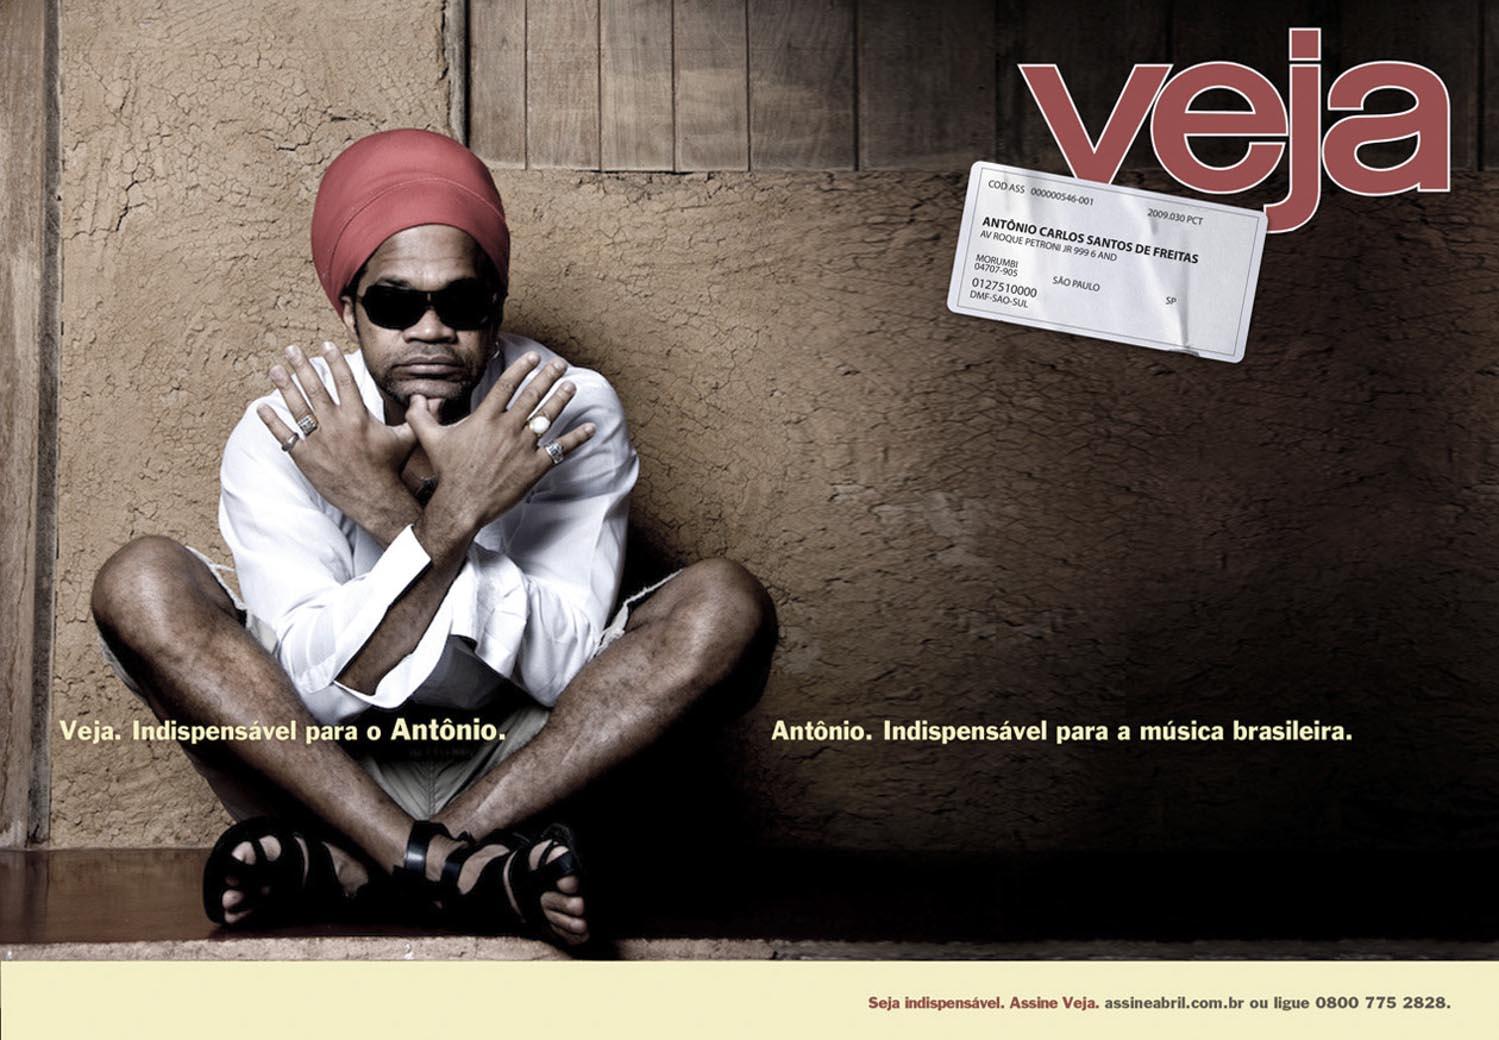 Veja magazine Campaign, Almap.